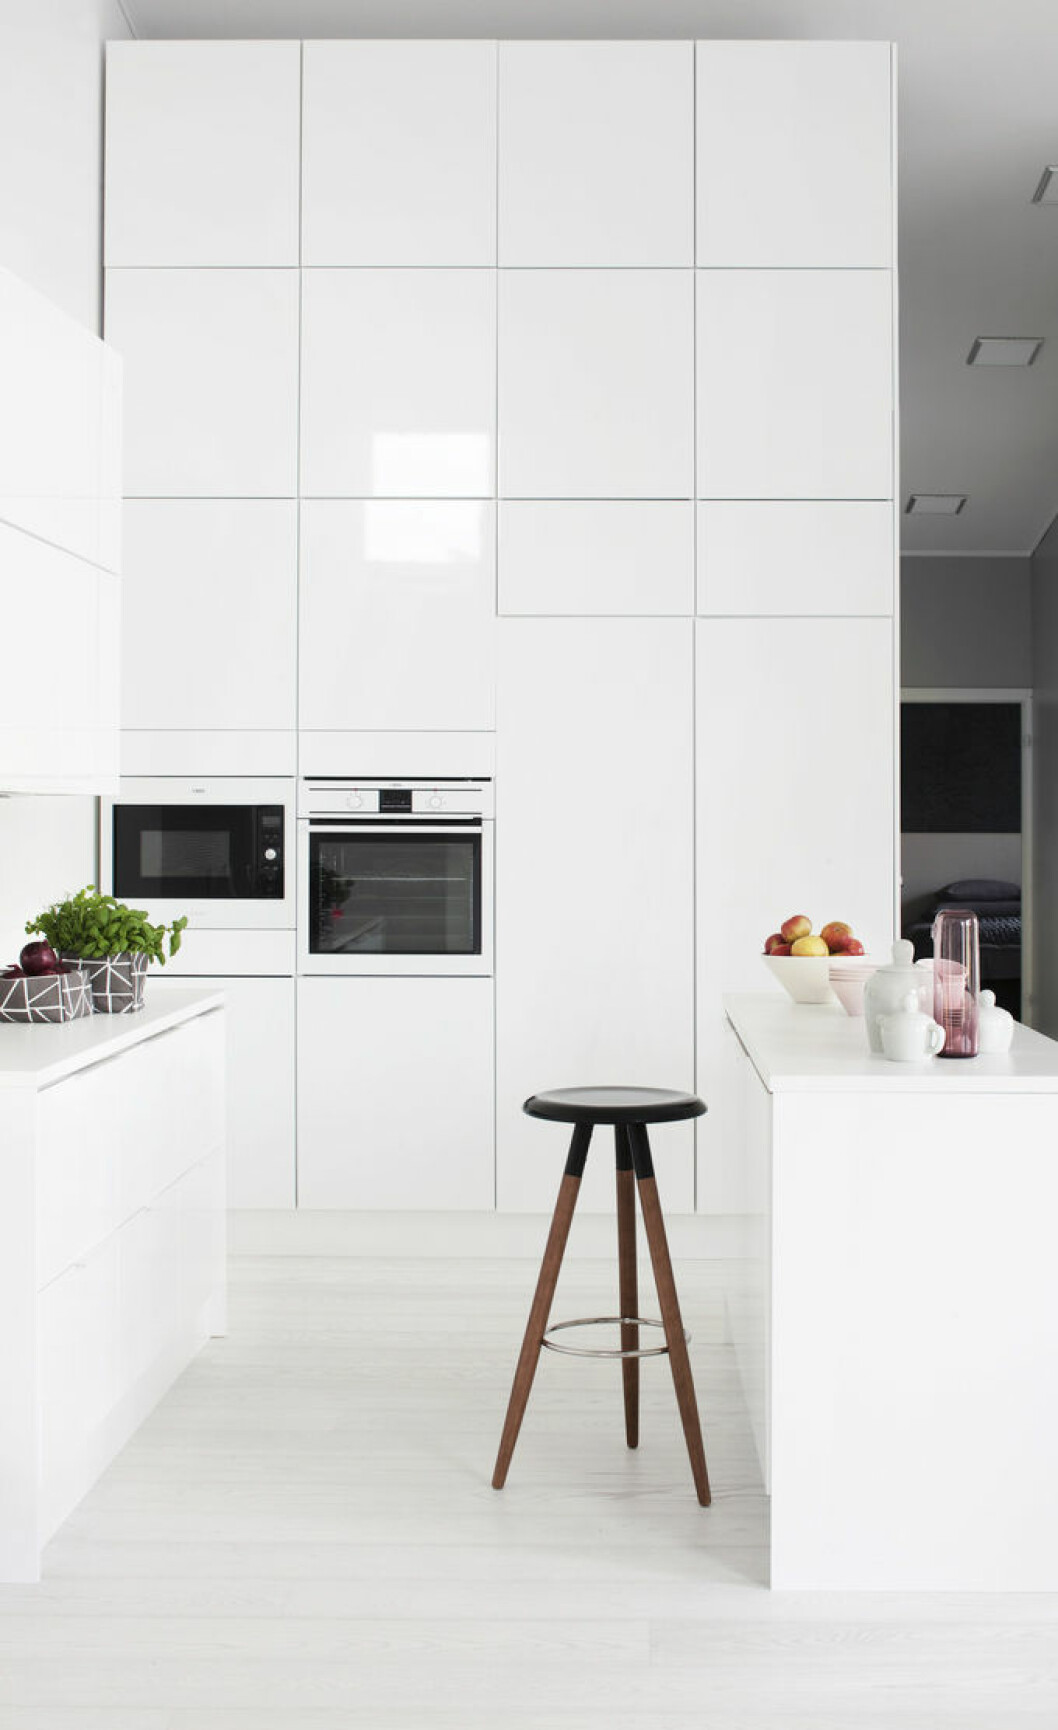 04. compact-kitchen